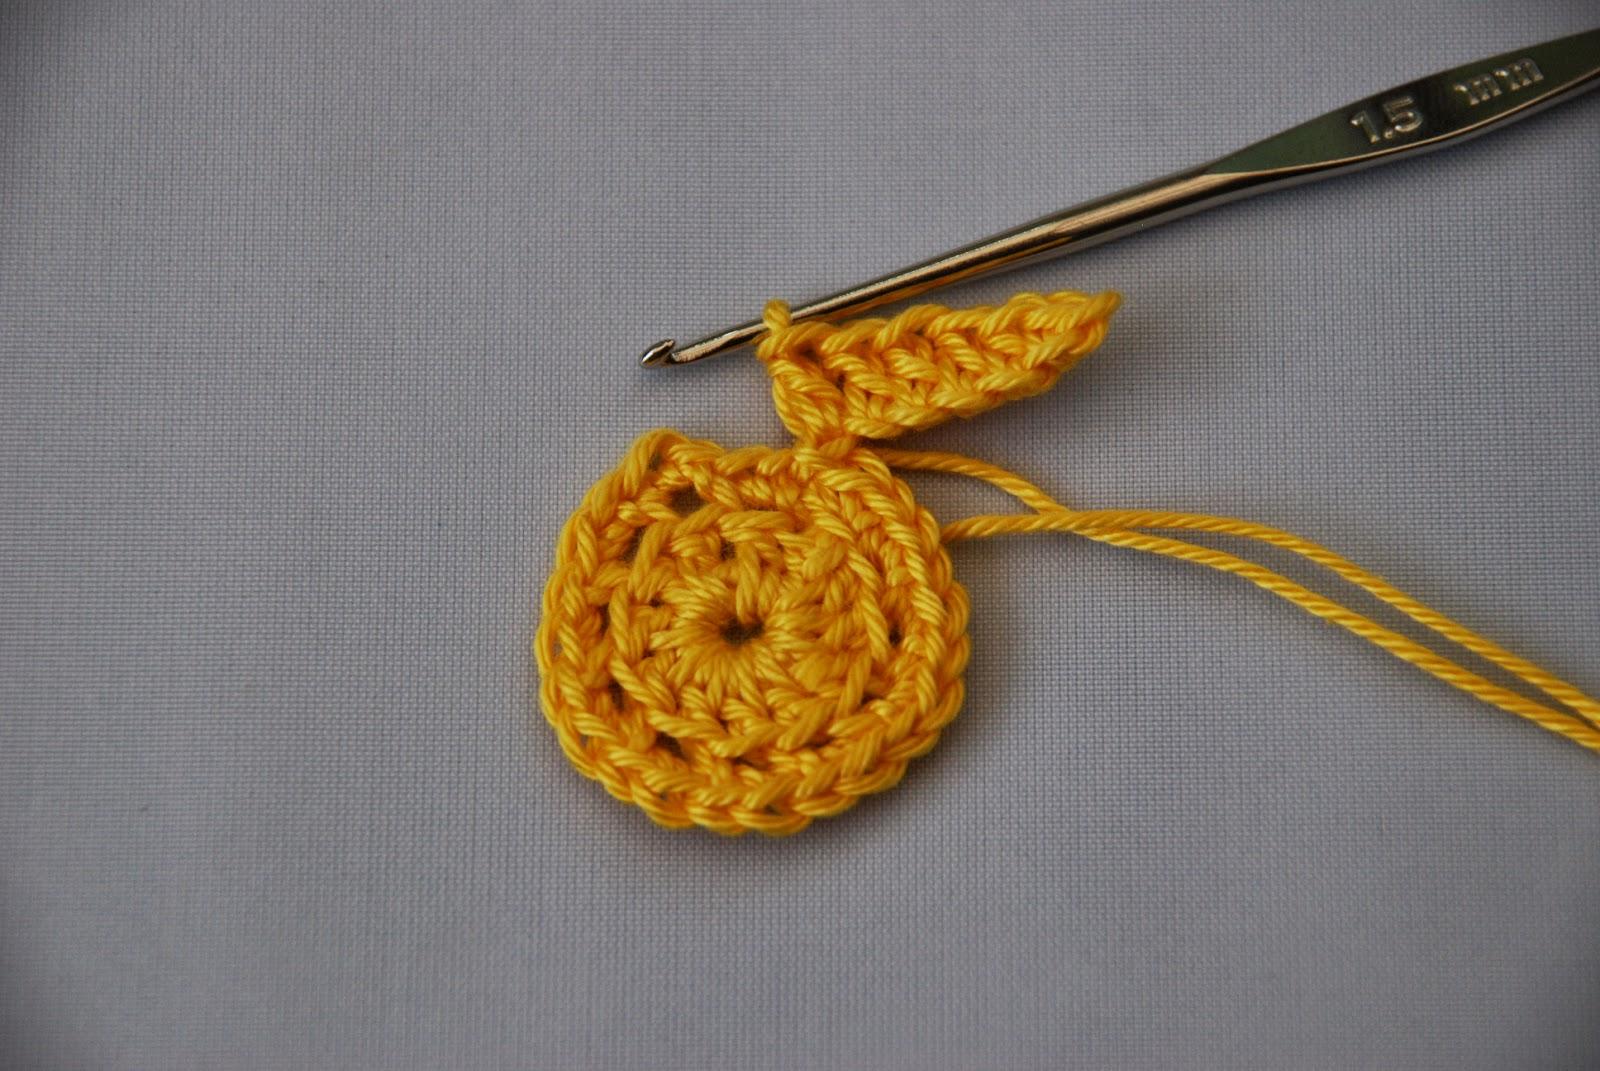 Crochet Daffodil pattern and tutorial: image of crochet petals